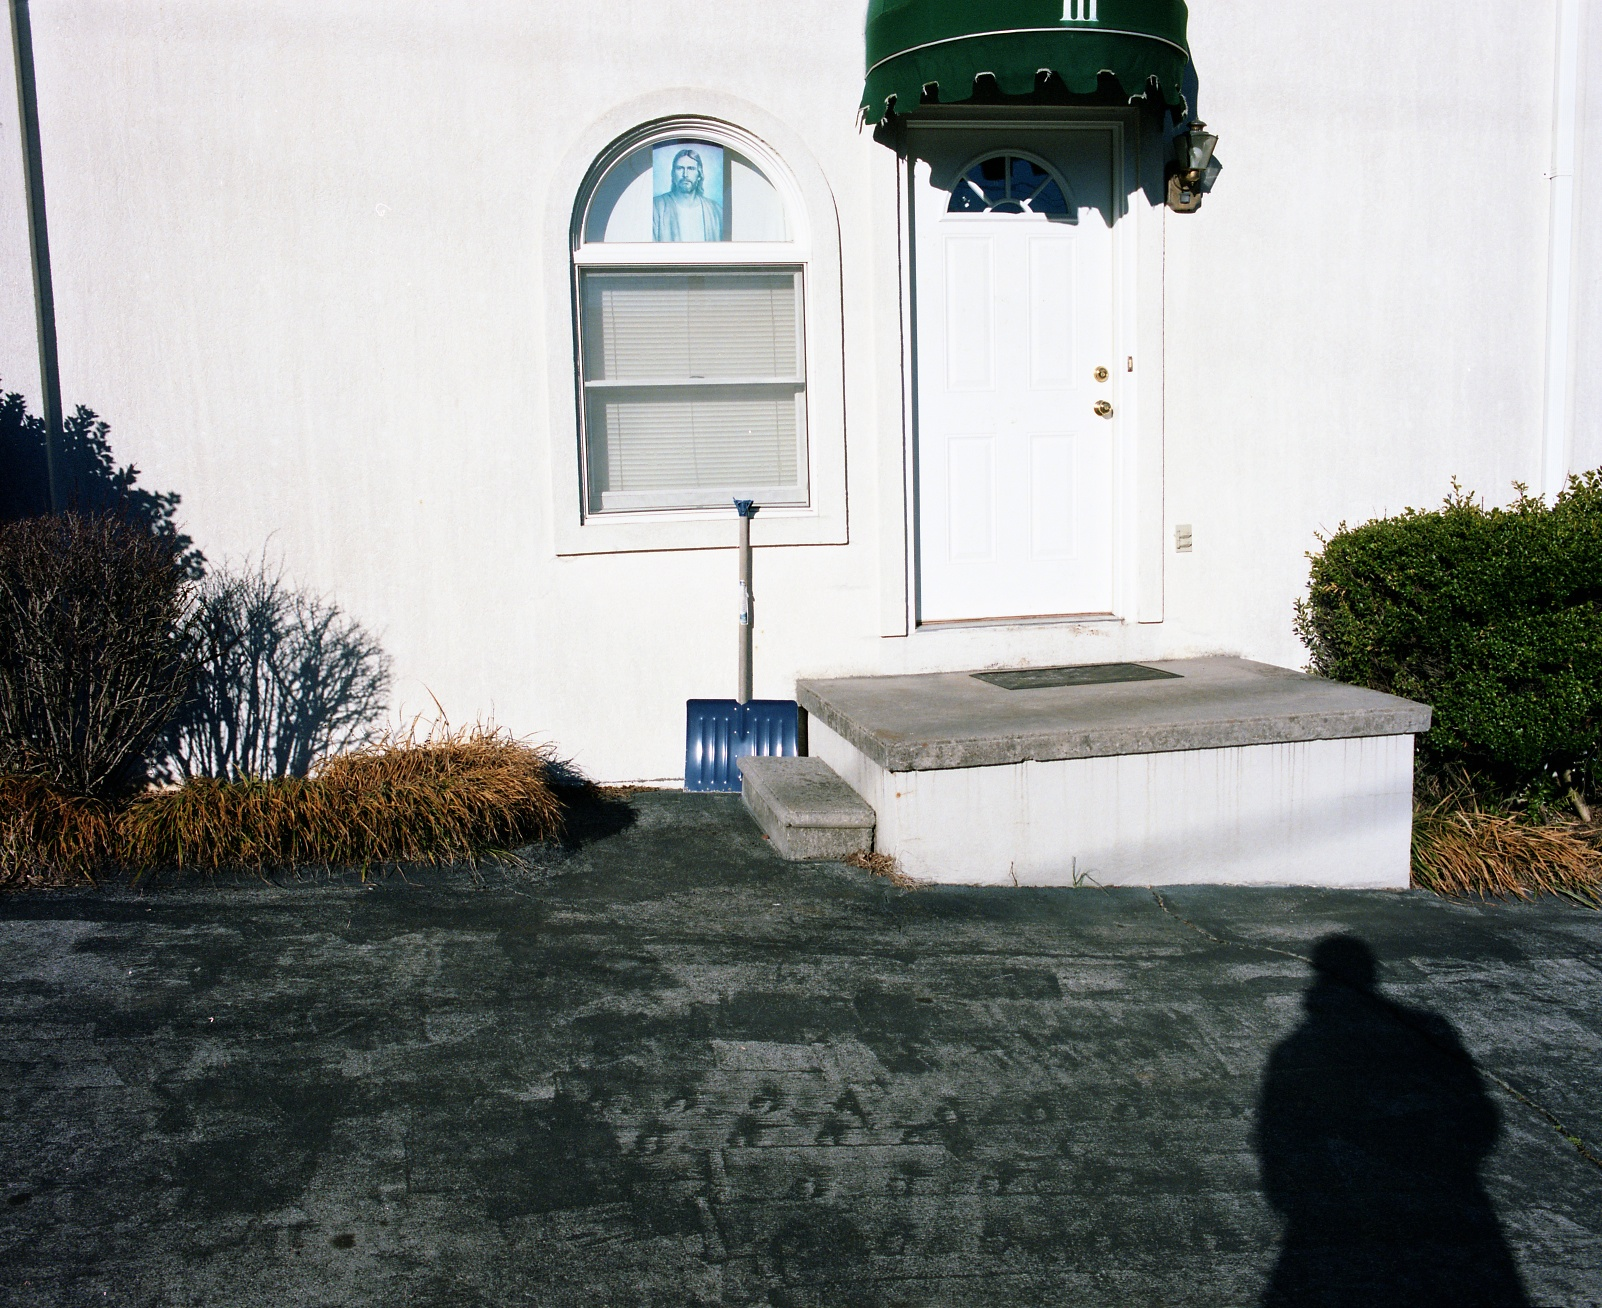 Neighborhood Watch, Johnson City, TN. 2014.